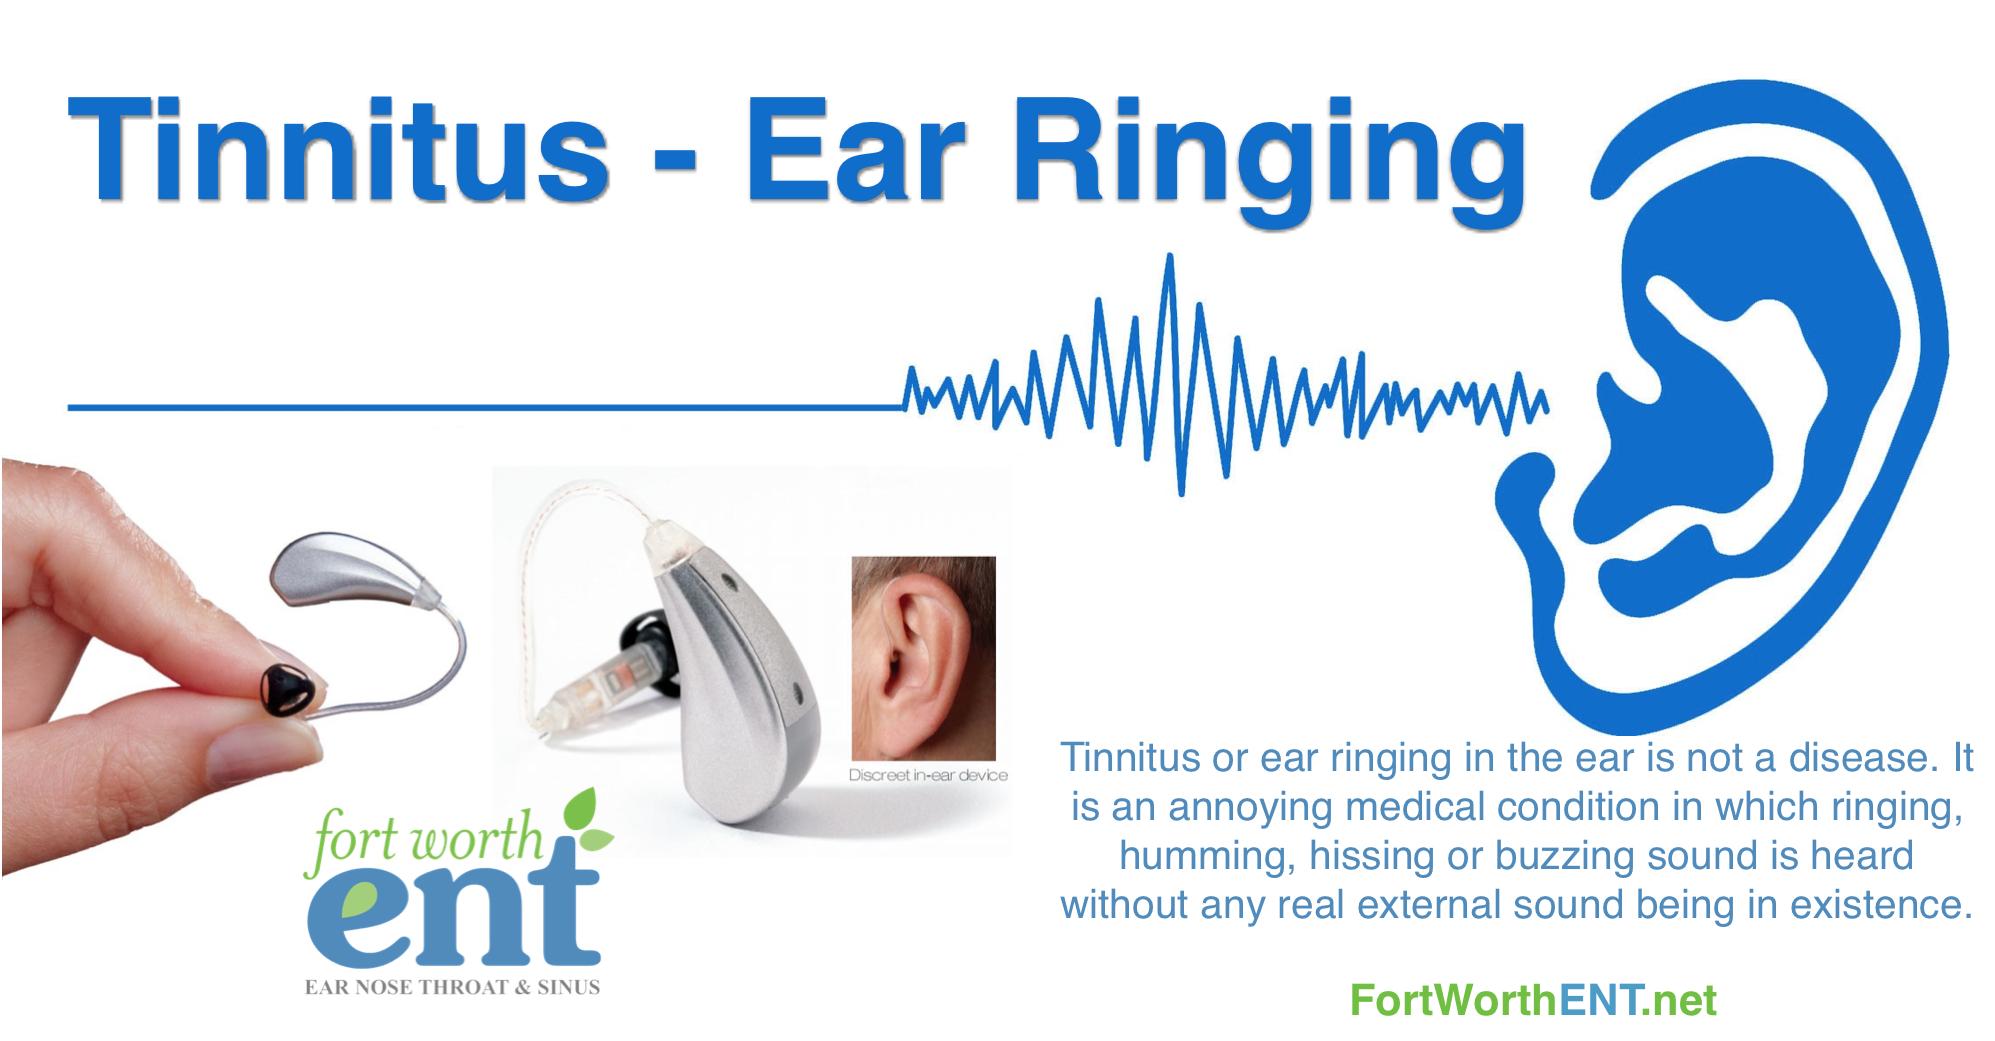 Tinnitus 911 Customer Reviews How To Treat Tinnitus Naturally Using Home Remedies